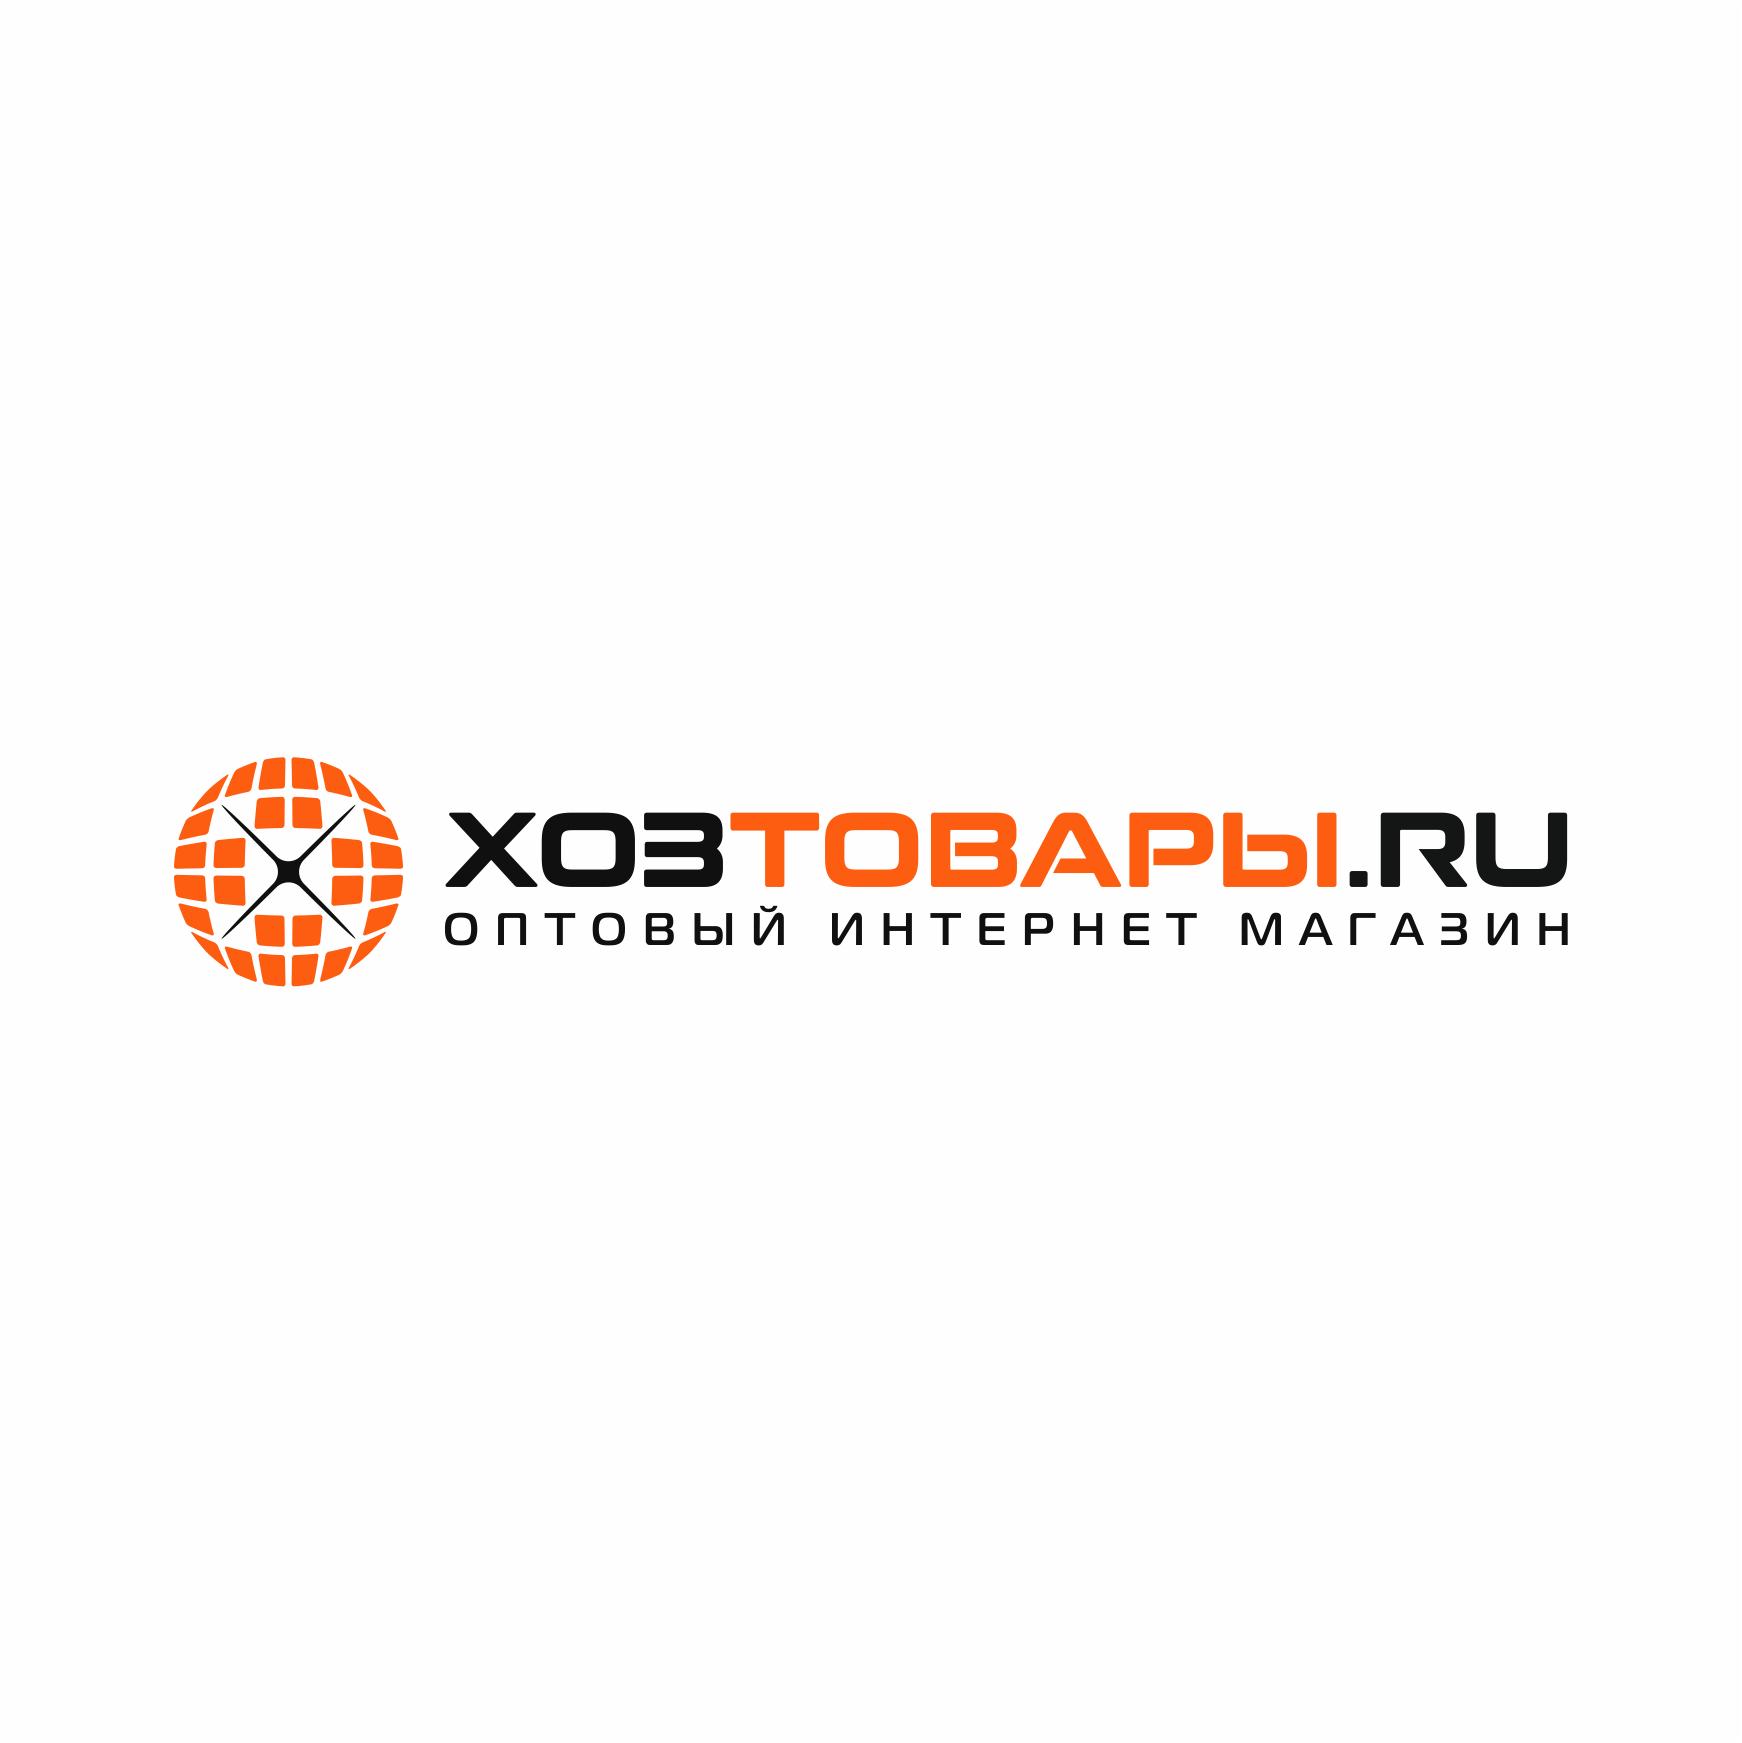 Разработка логотипа для оптового интернет-магазина «Хозтовары.ру» фото f_632606f05f347fa7.png